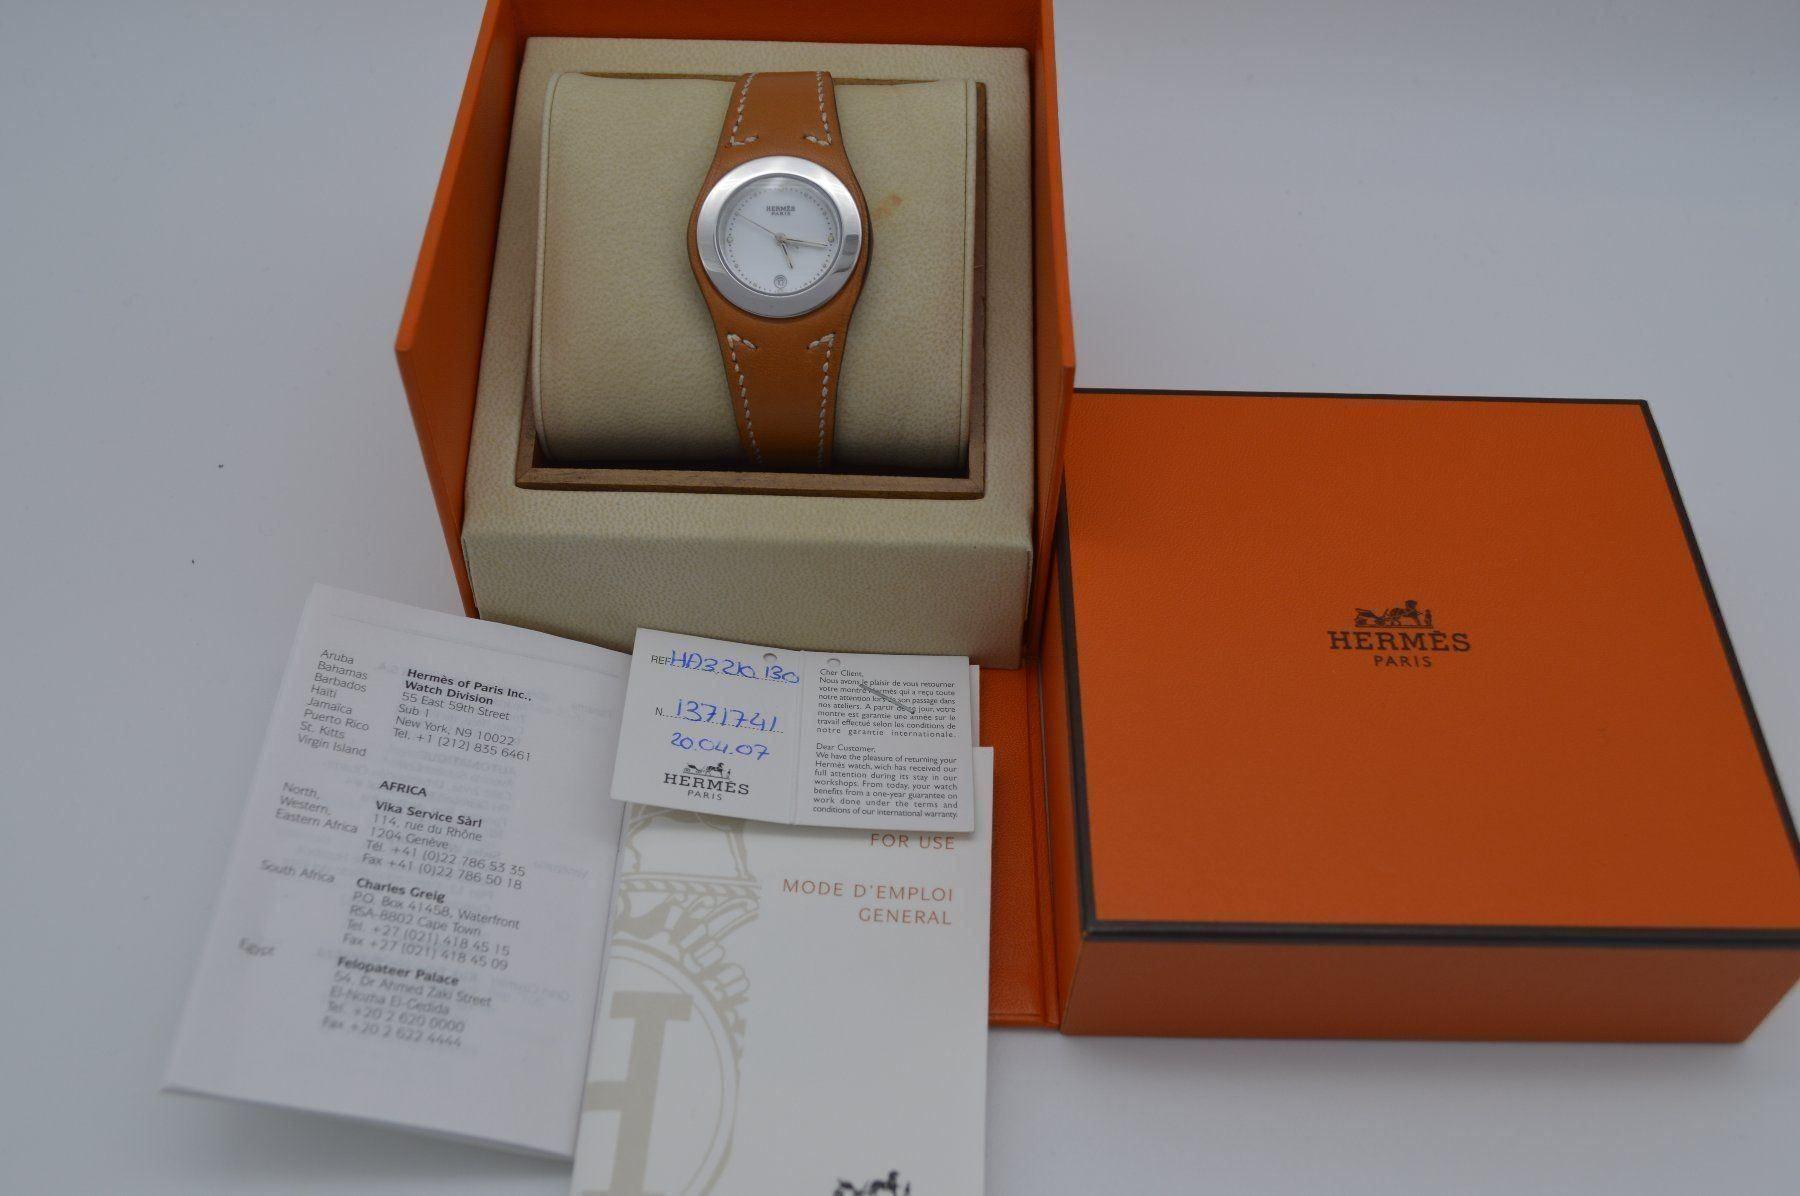 Herms / Harnais HA3.210 - Lady's Steel Wrist Watch - Image 5 of 6